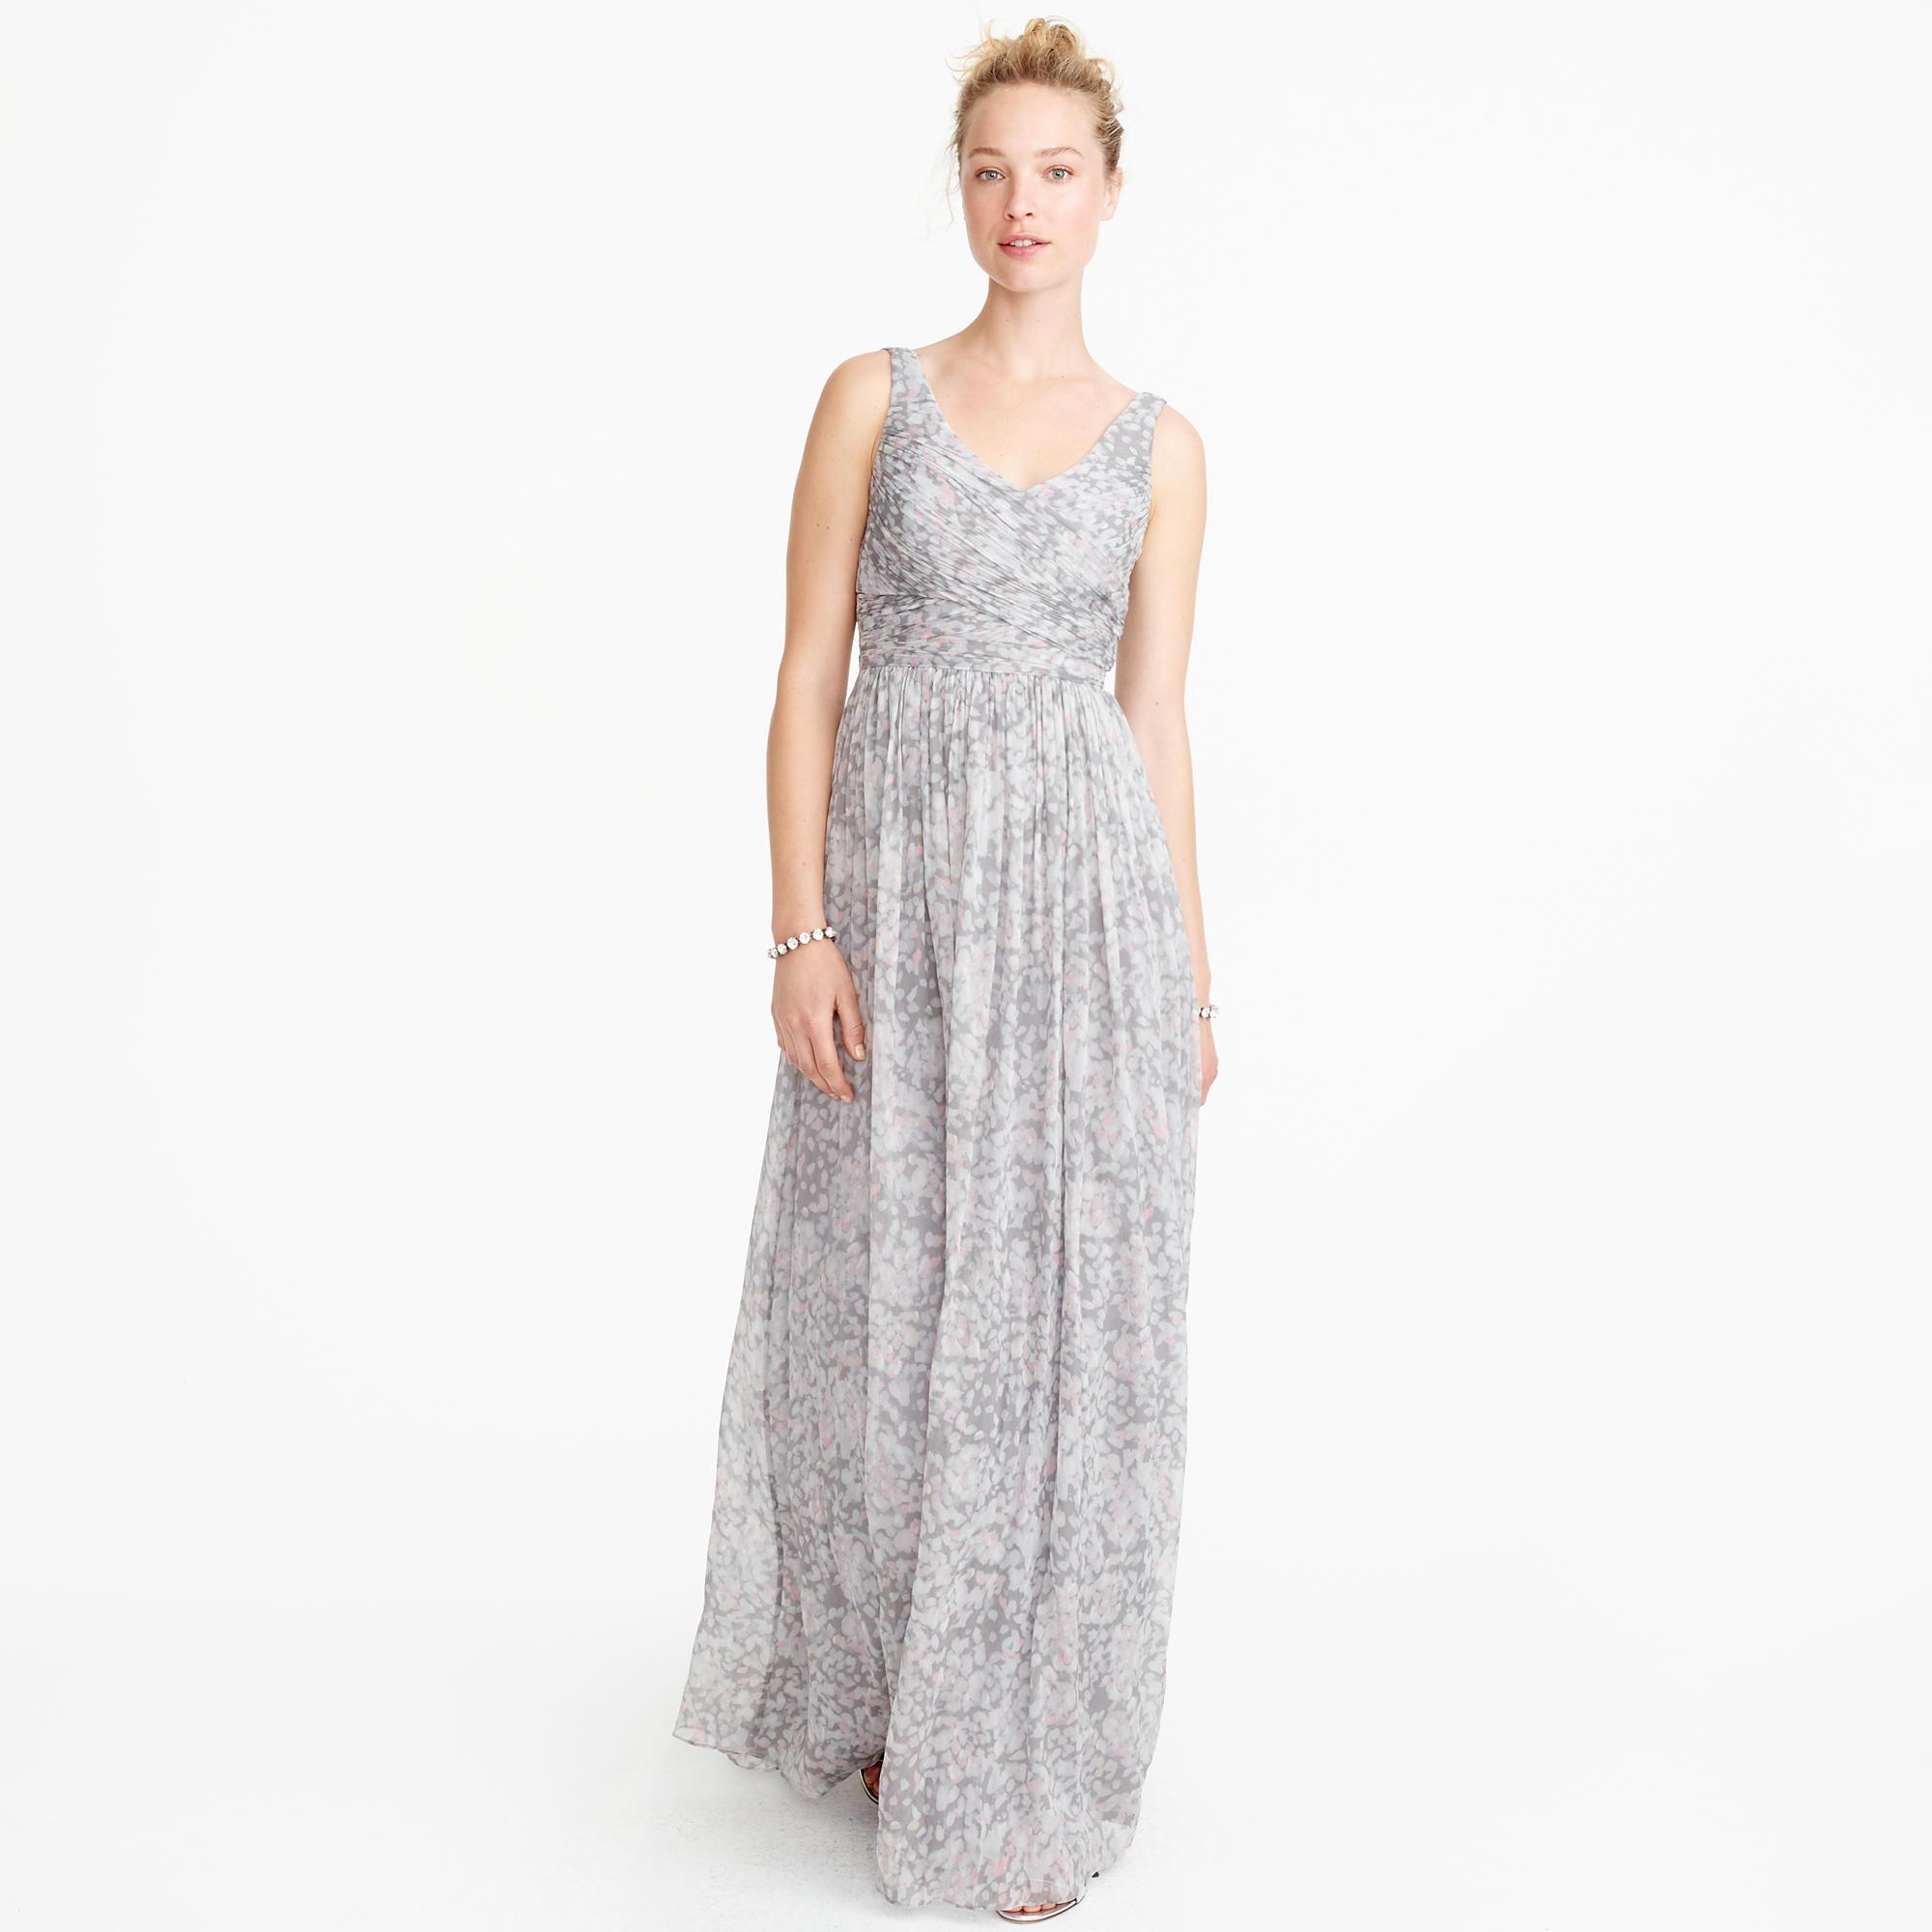 Heidi long dress in watercolor silk chiffon : Wedding sizes 16 to ...